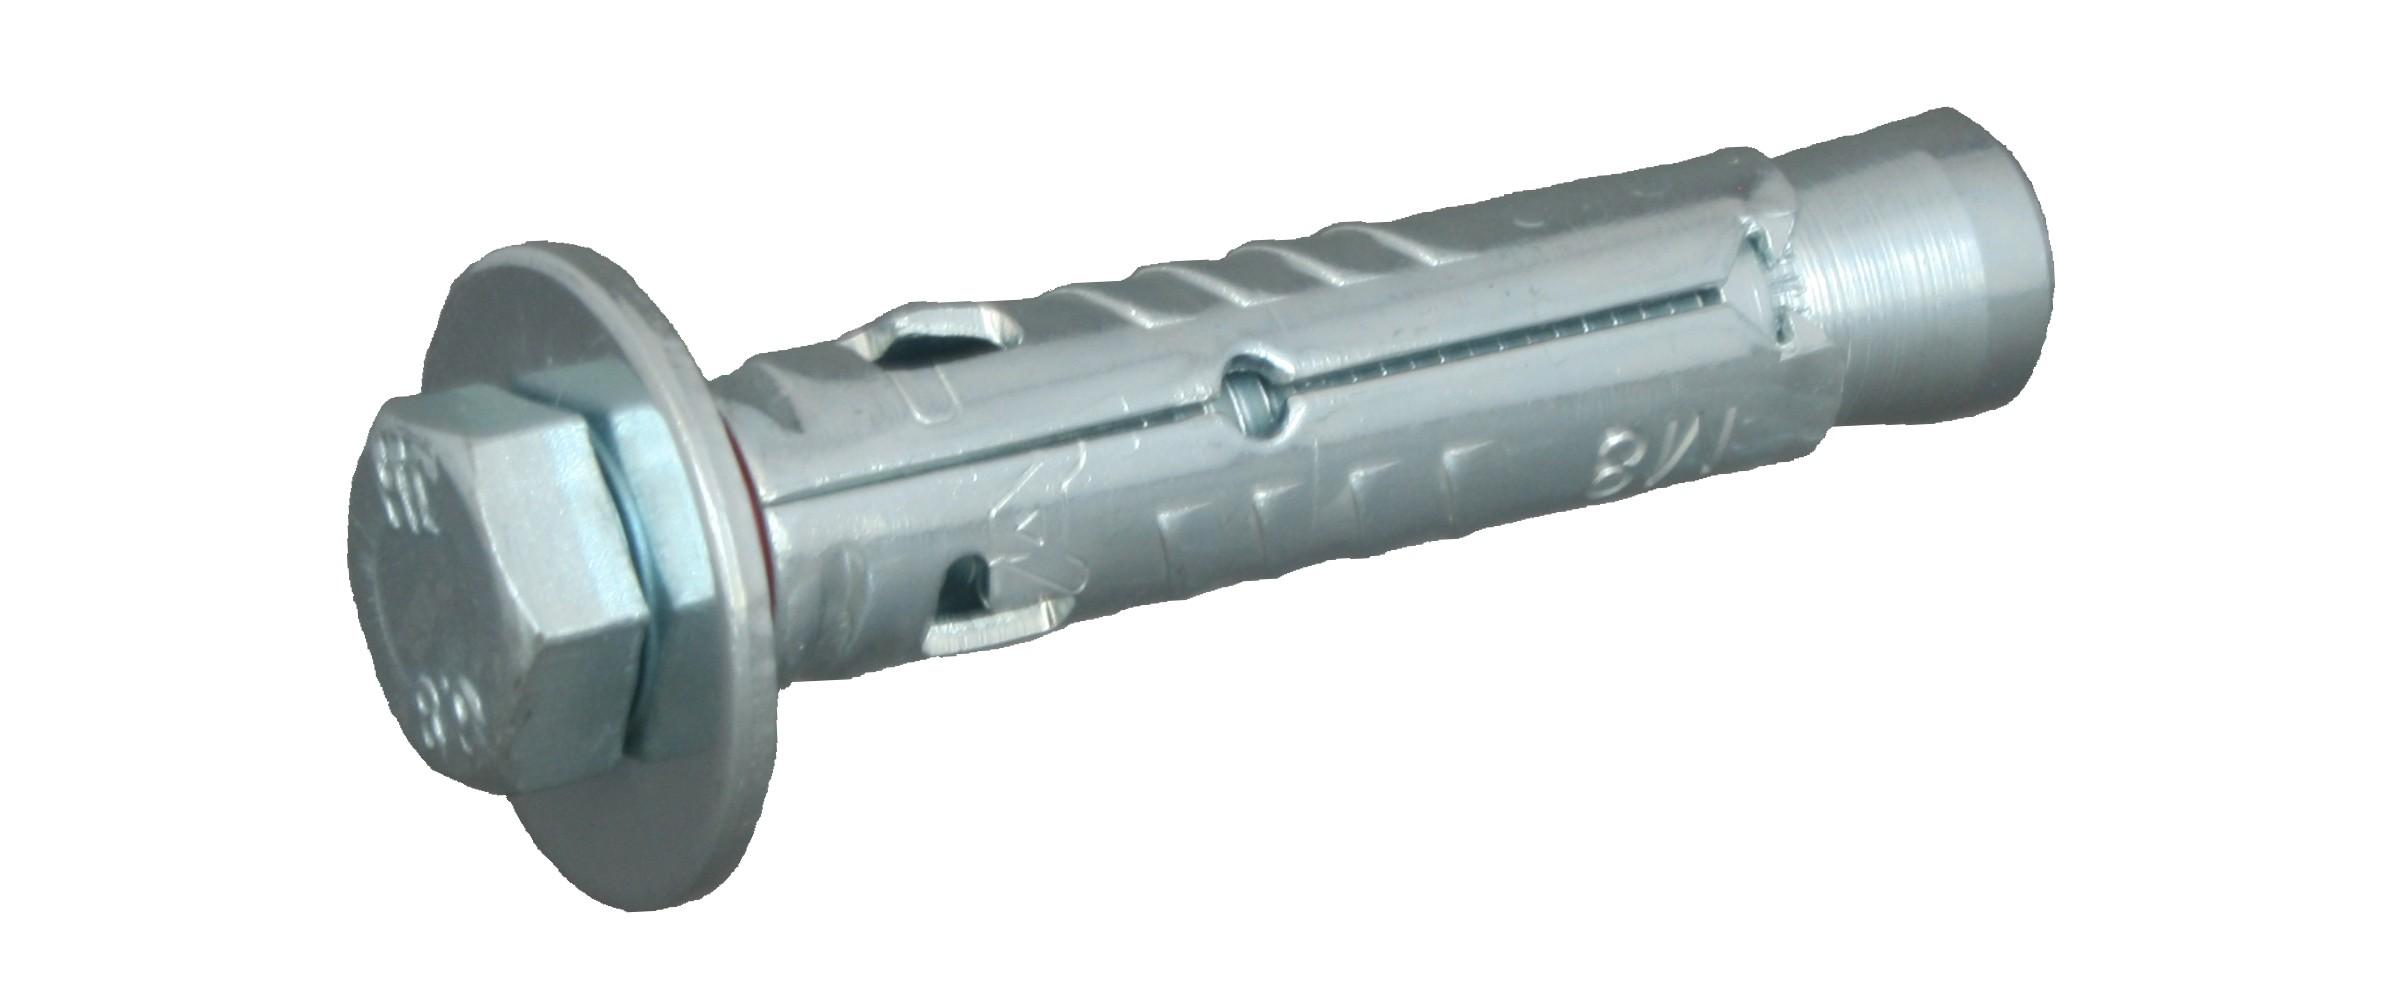 Spreidplug M8 12x60 EV